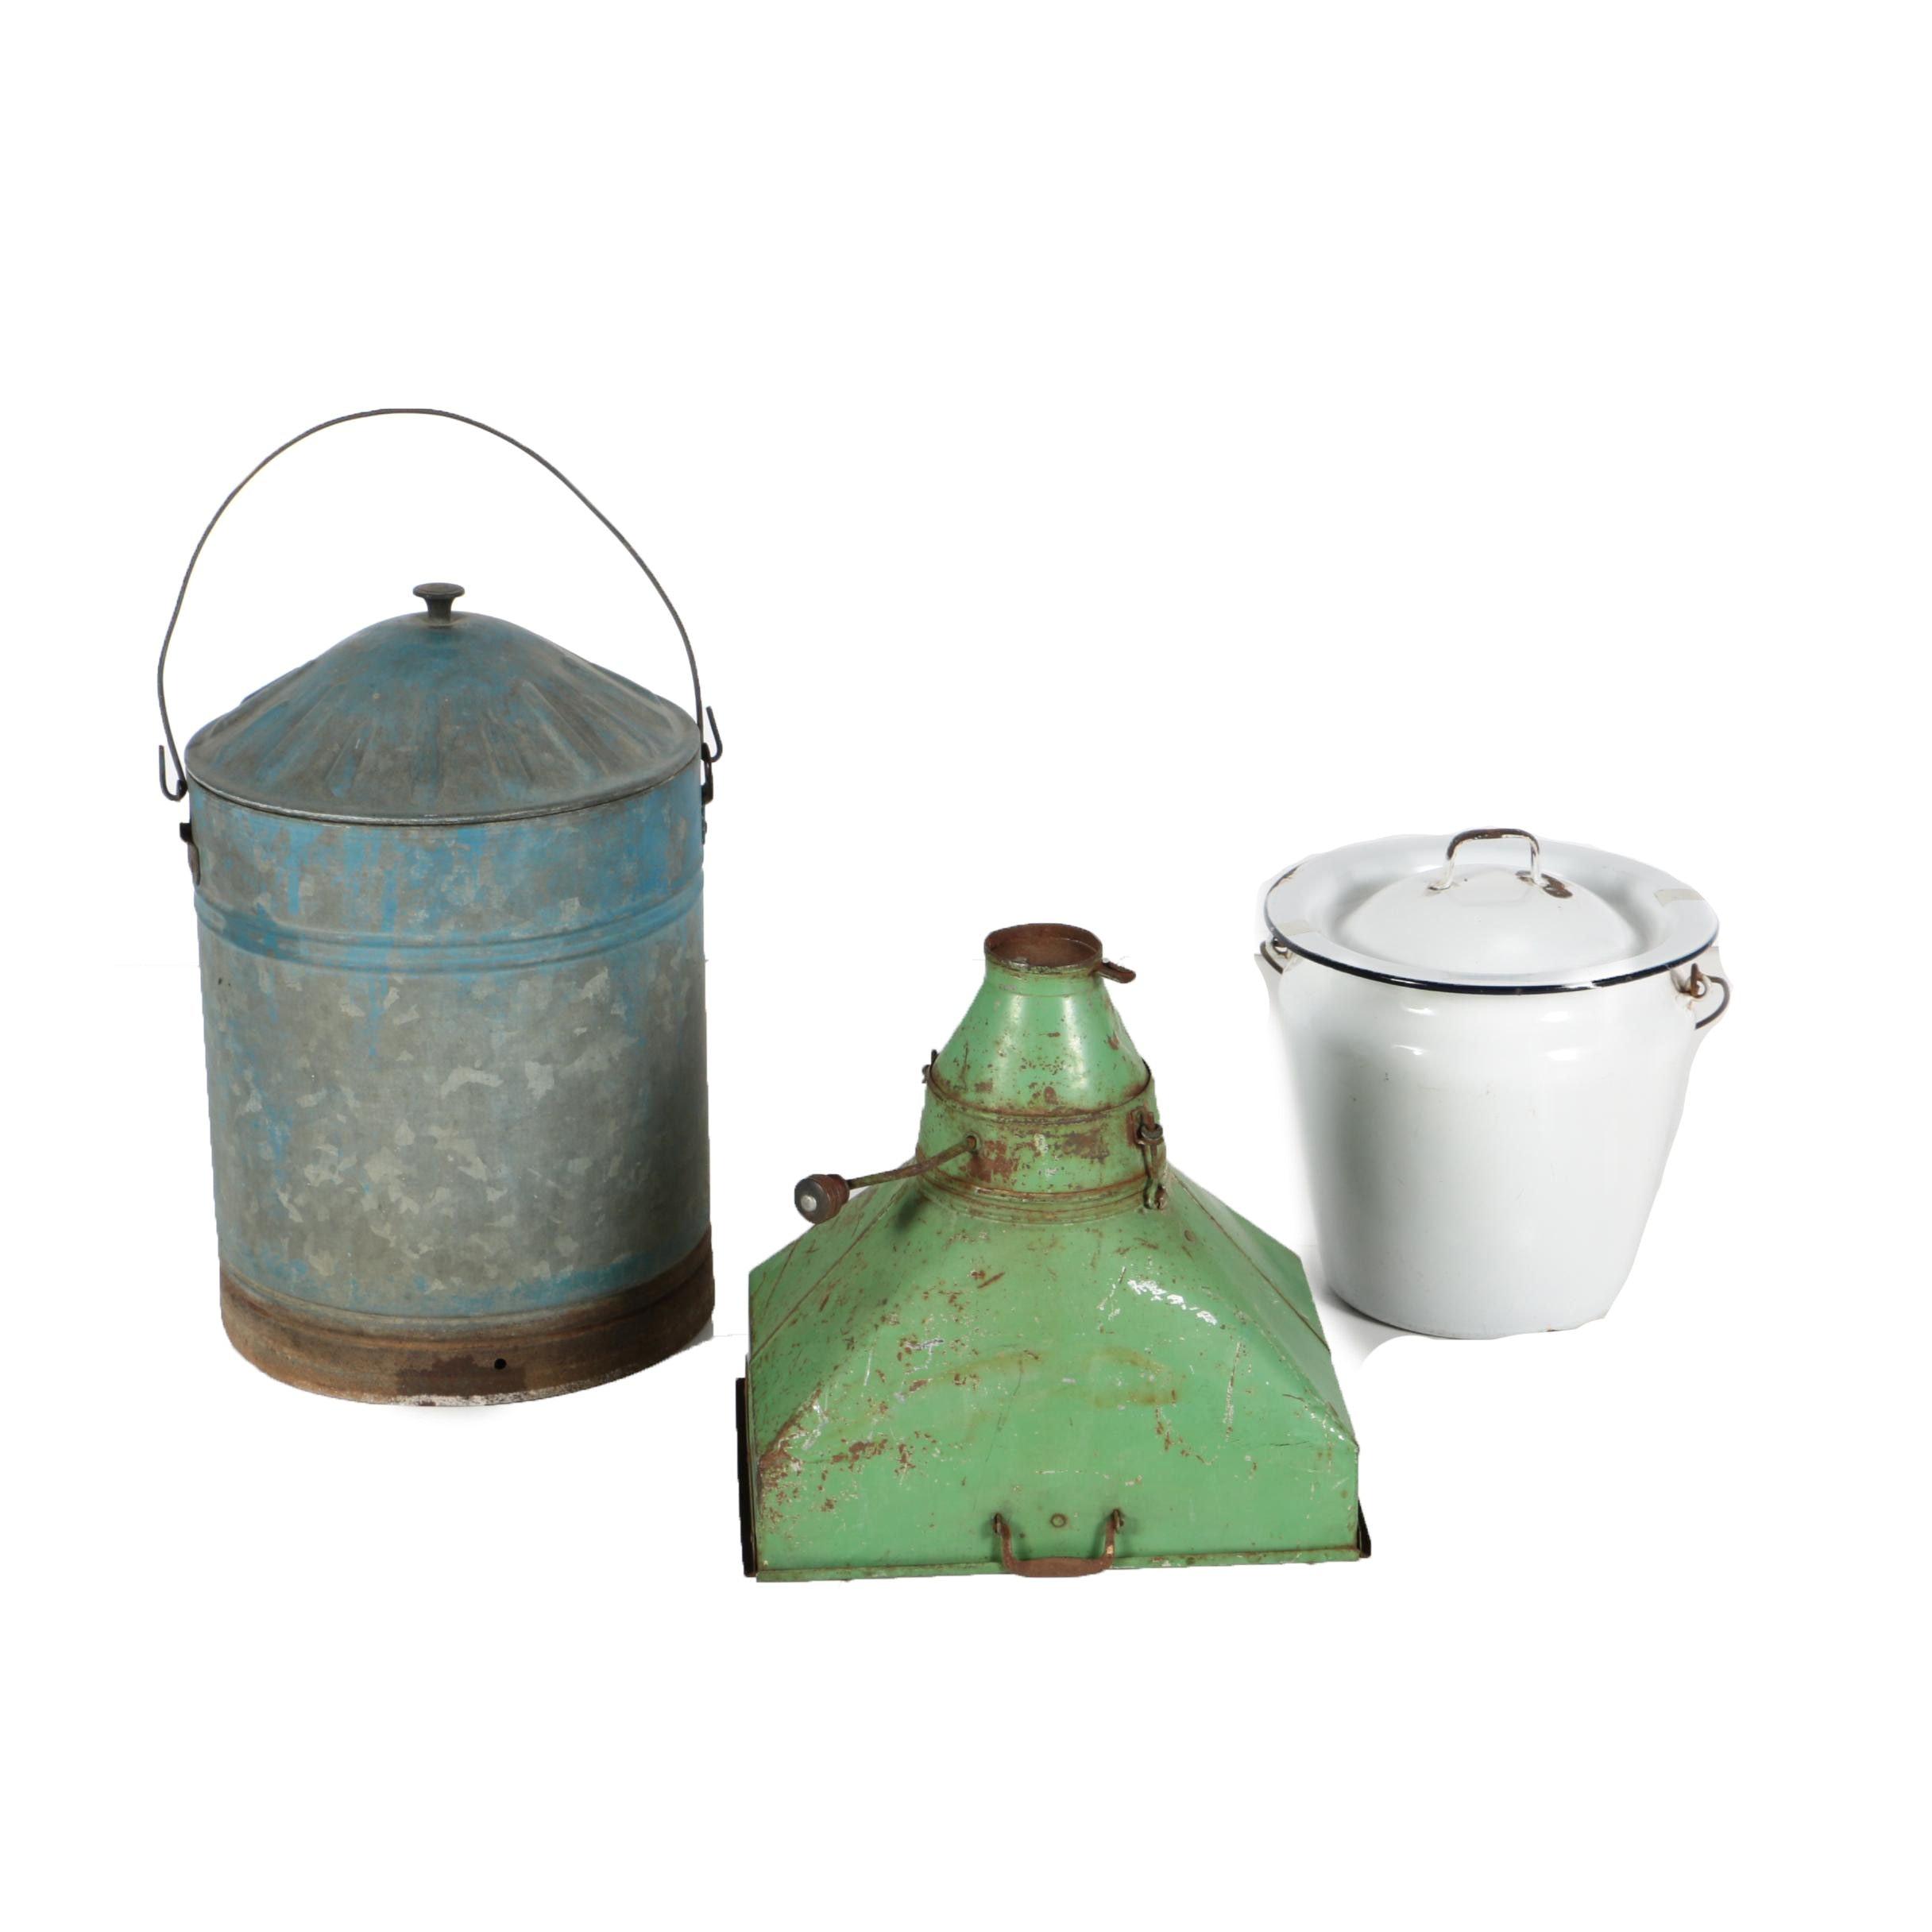 Enamel Pan, Commercial Sifter and Metal Jug